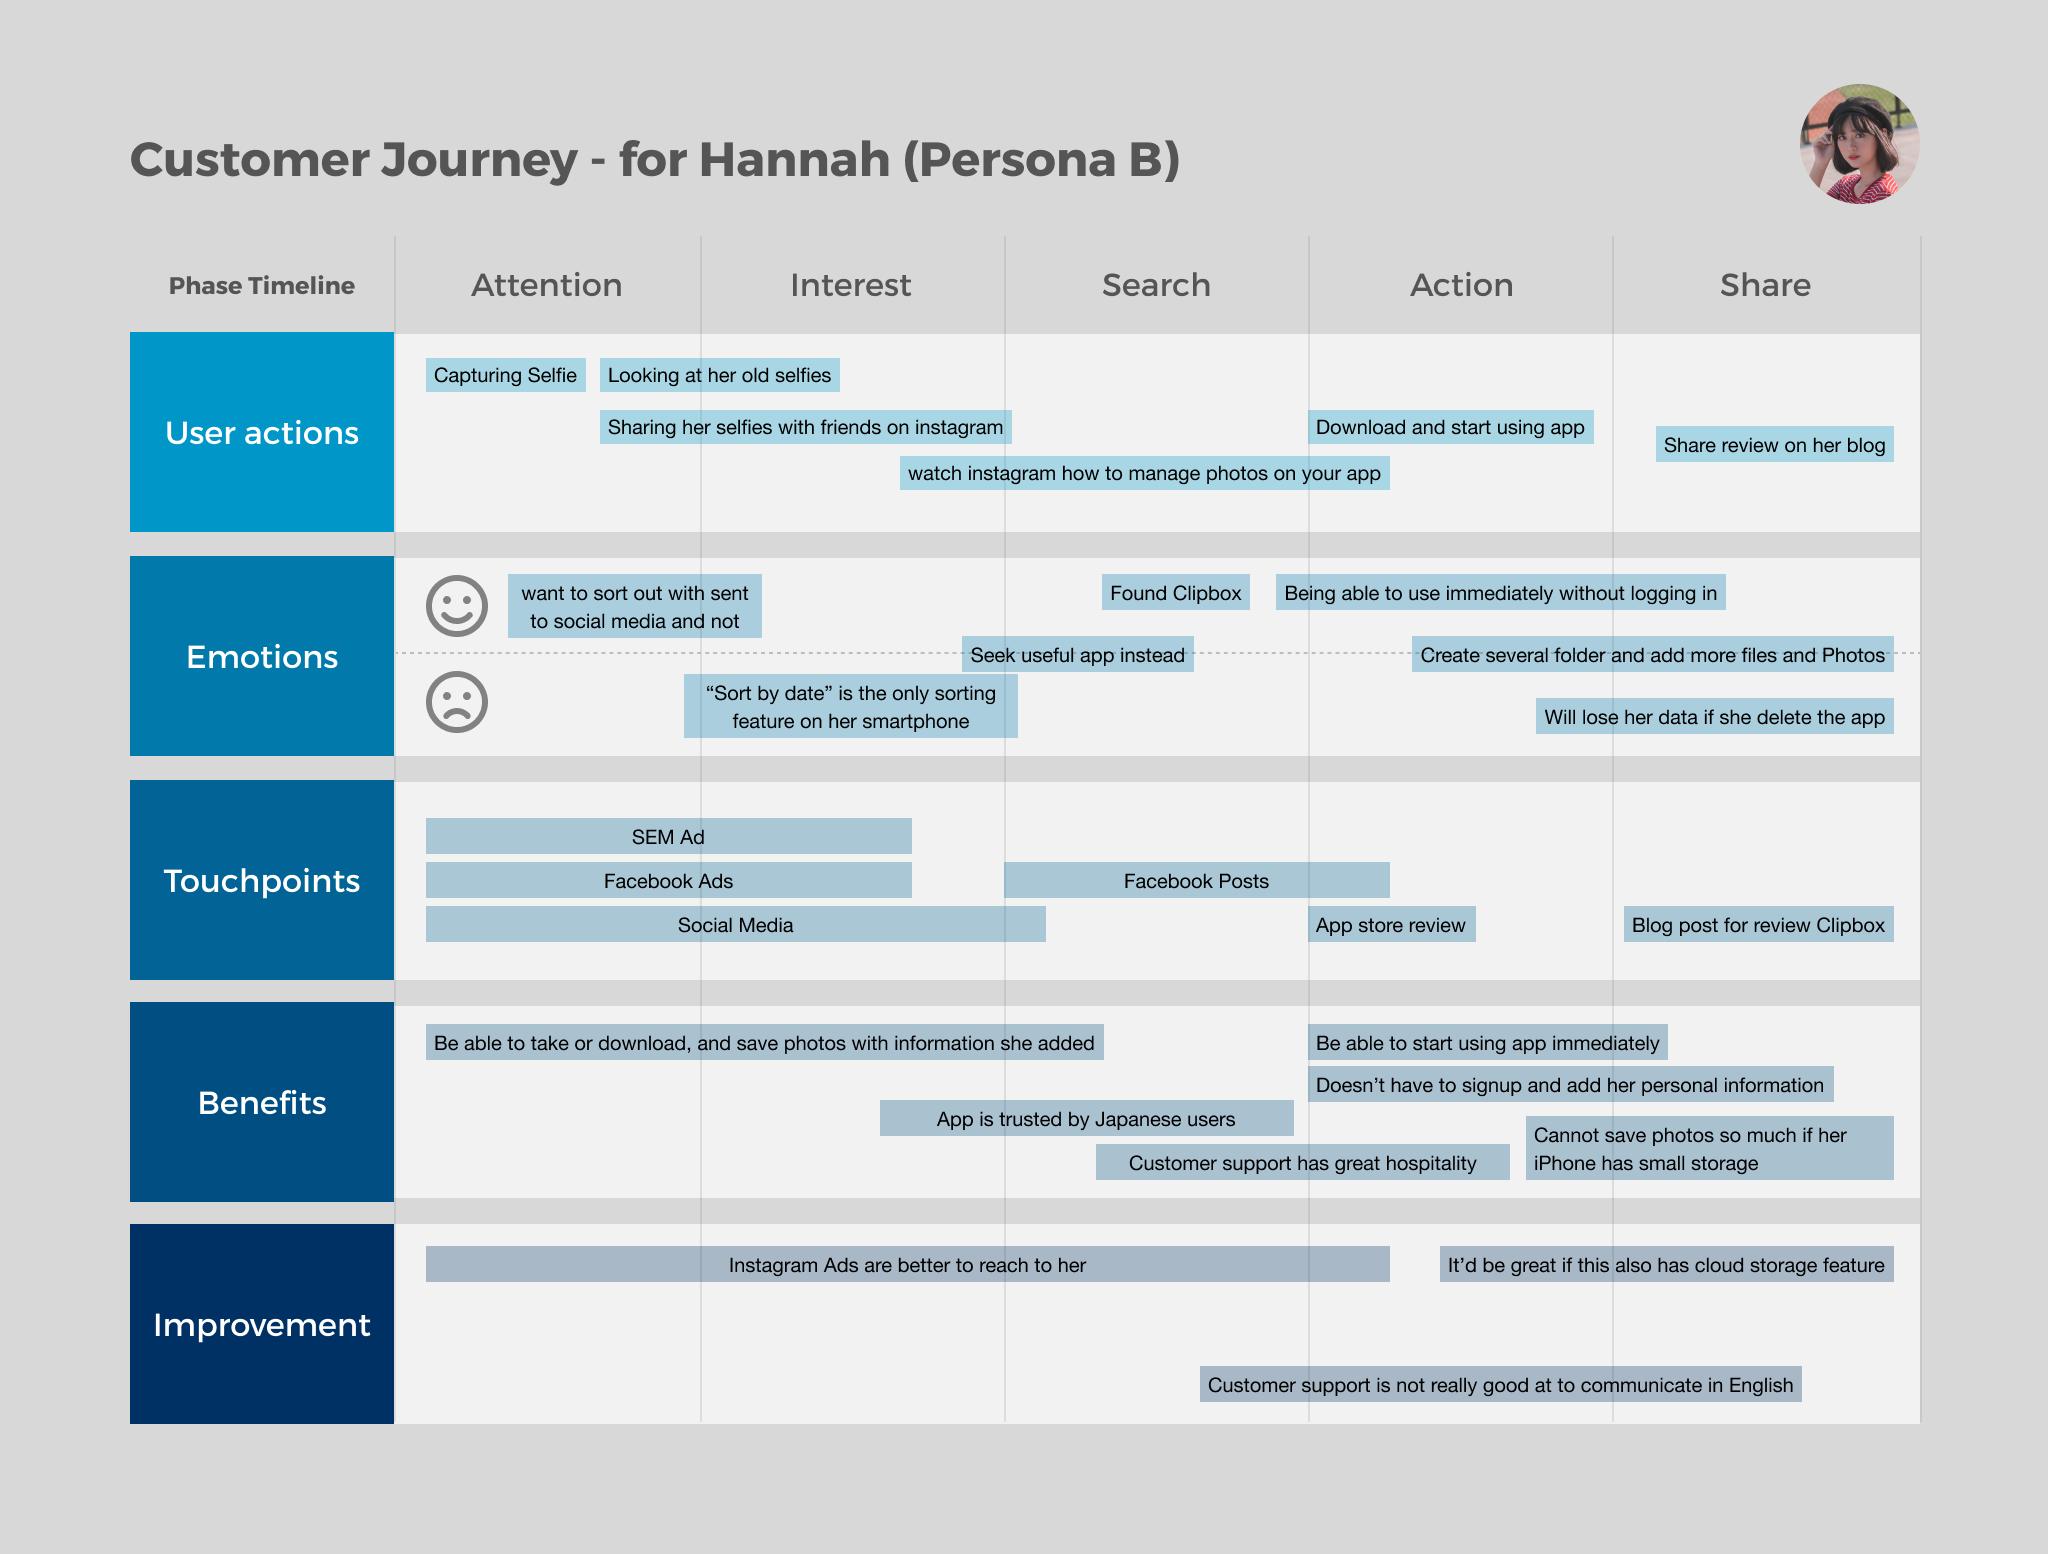 Customer Journey - Hannah